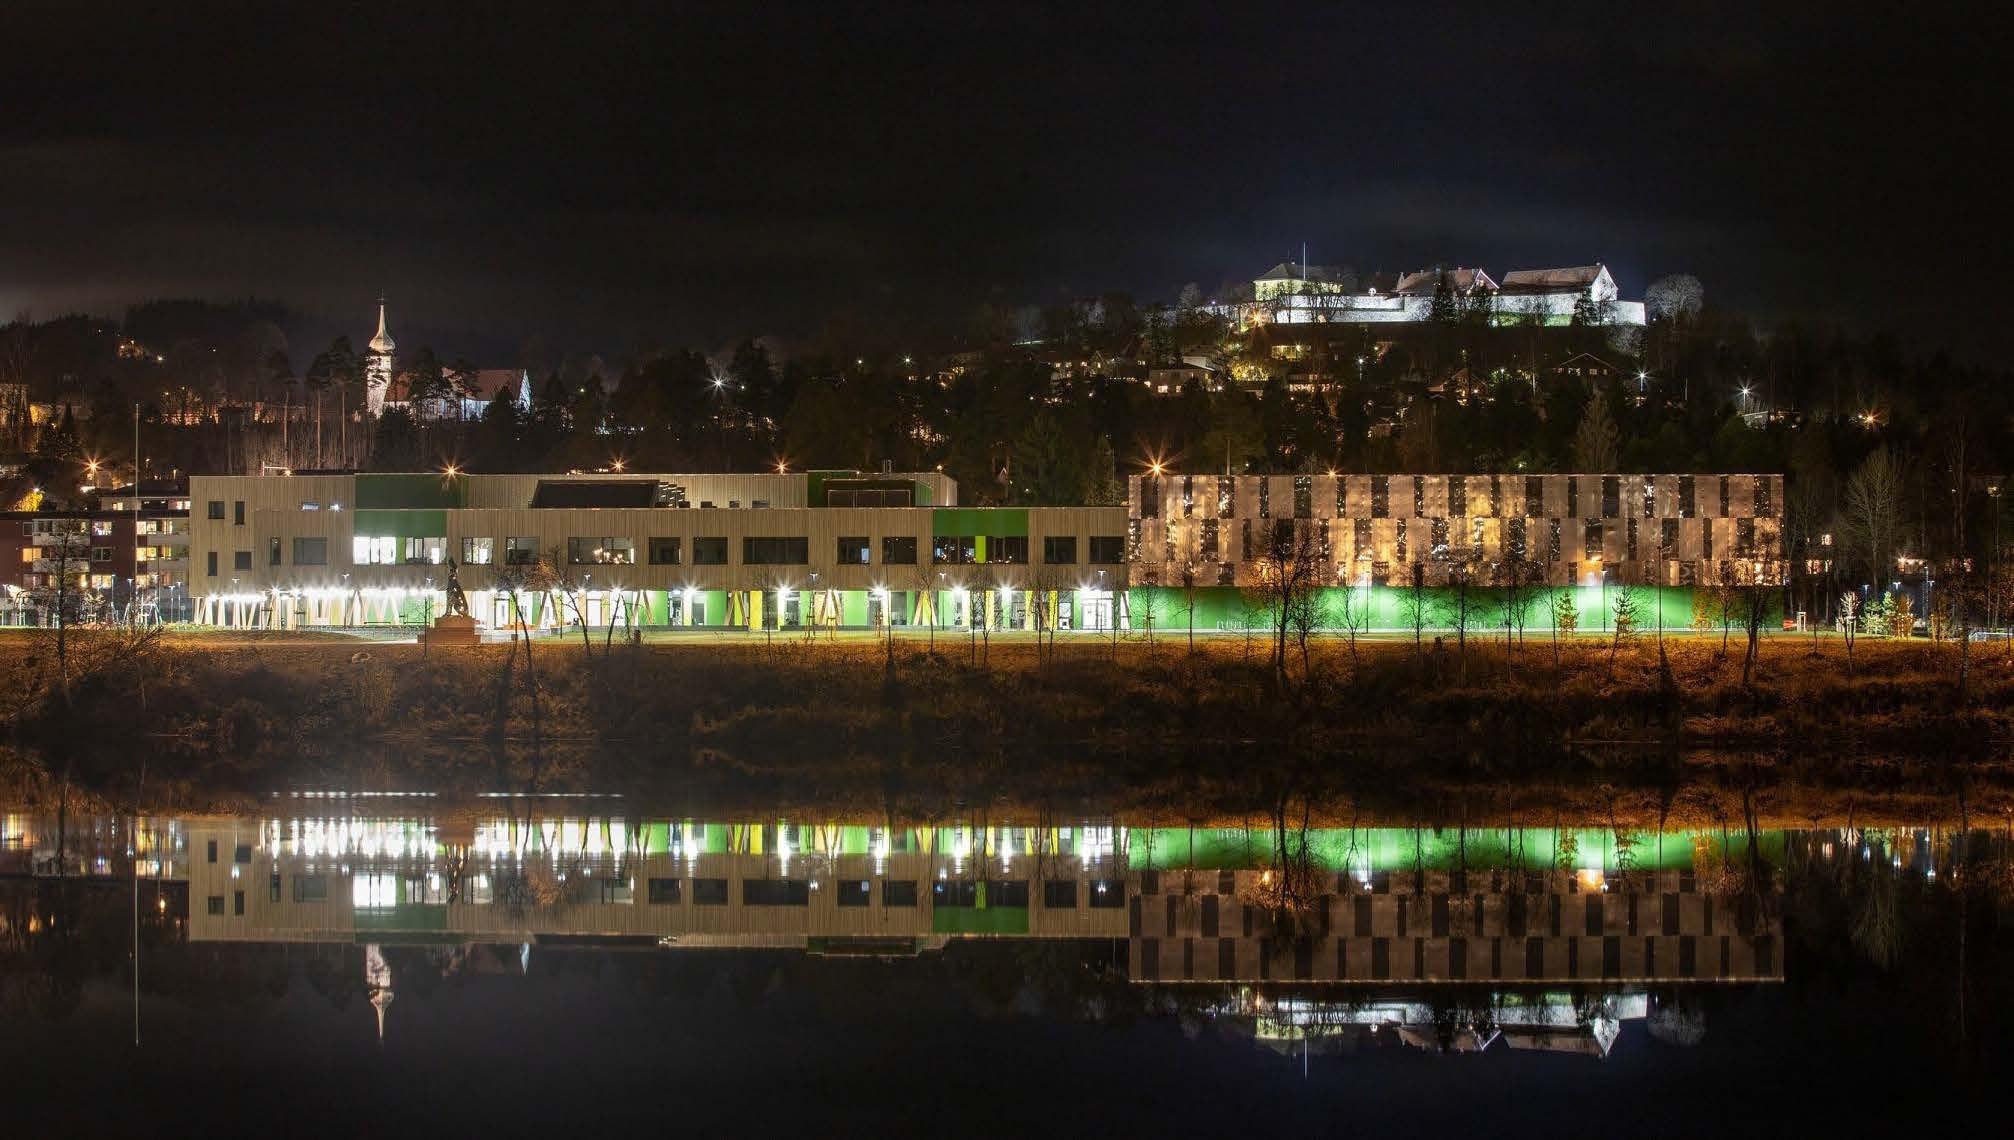 Human settlement, Urban area, Reflection, Sky, City, Light, Water, Night